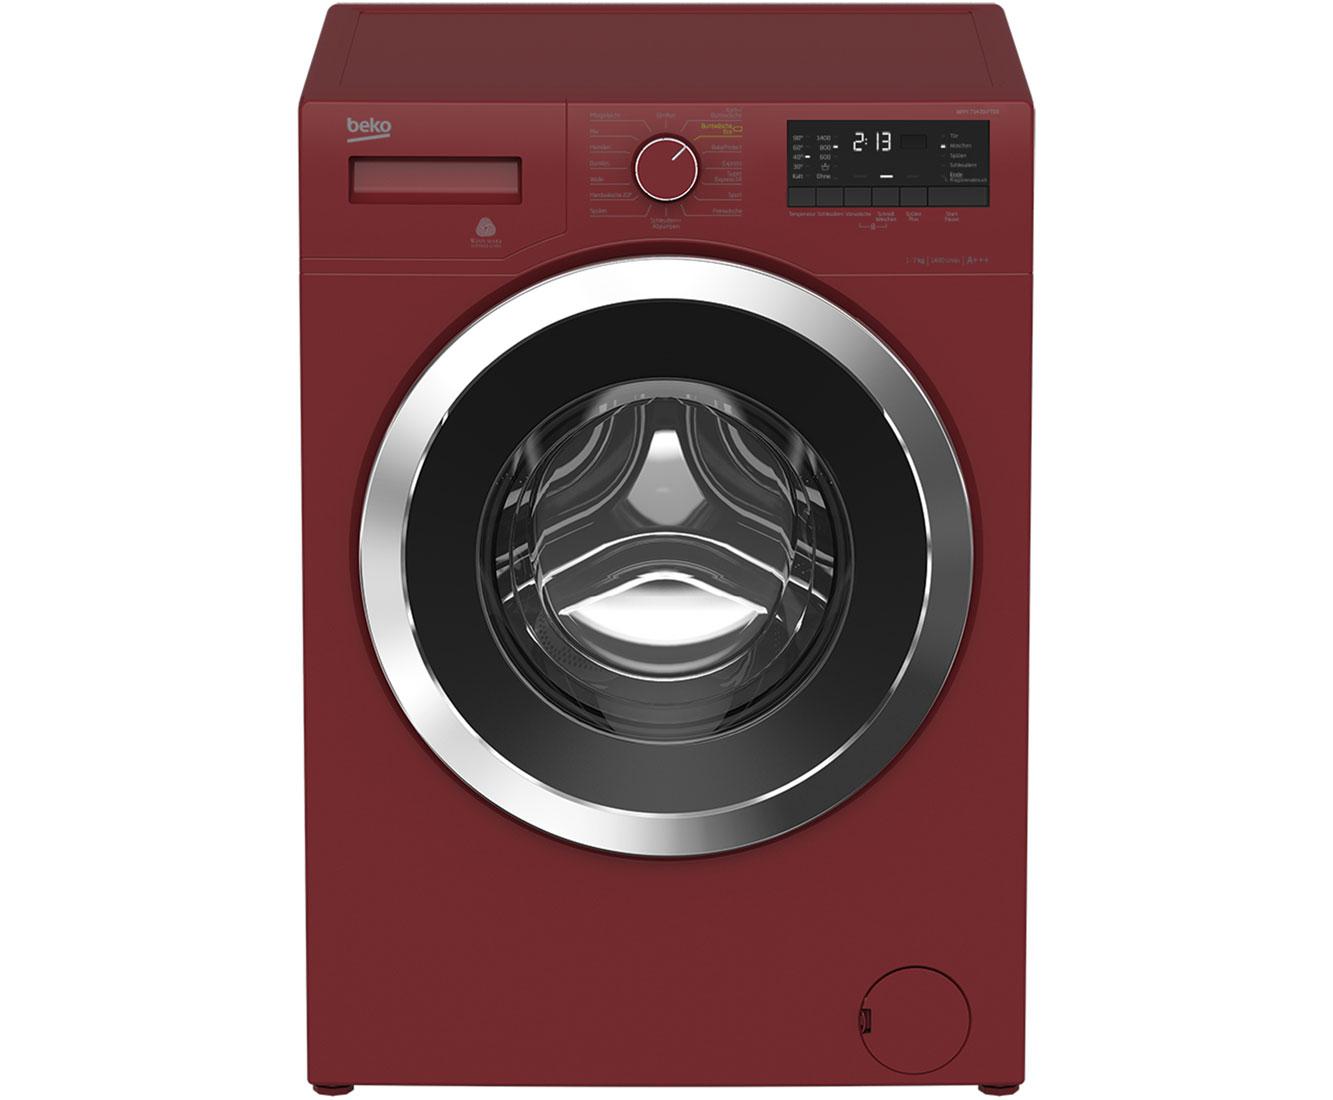 Beko wmy pter waschmaschine rot kg u min a